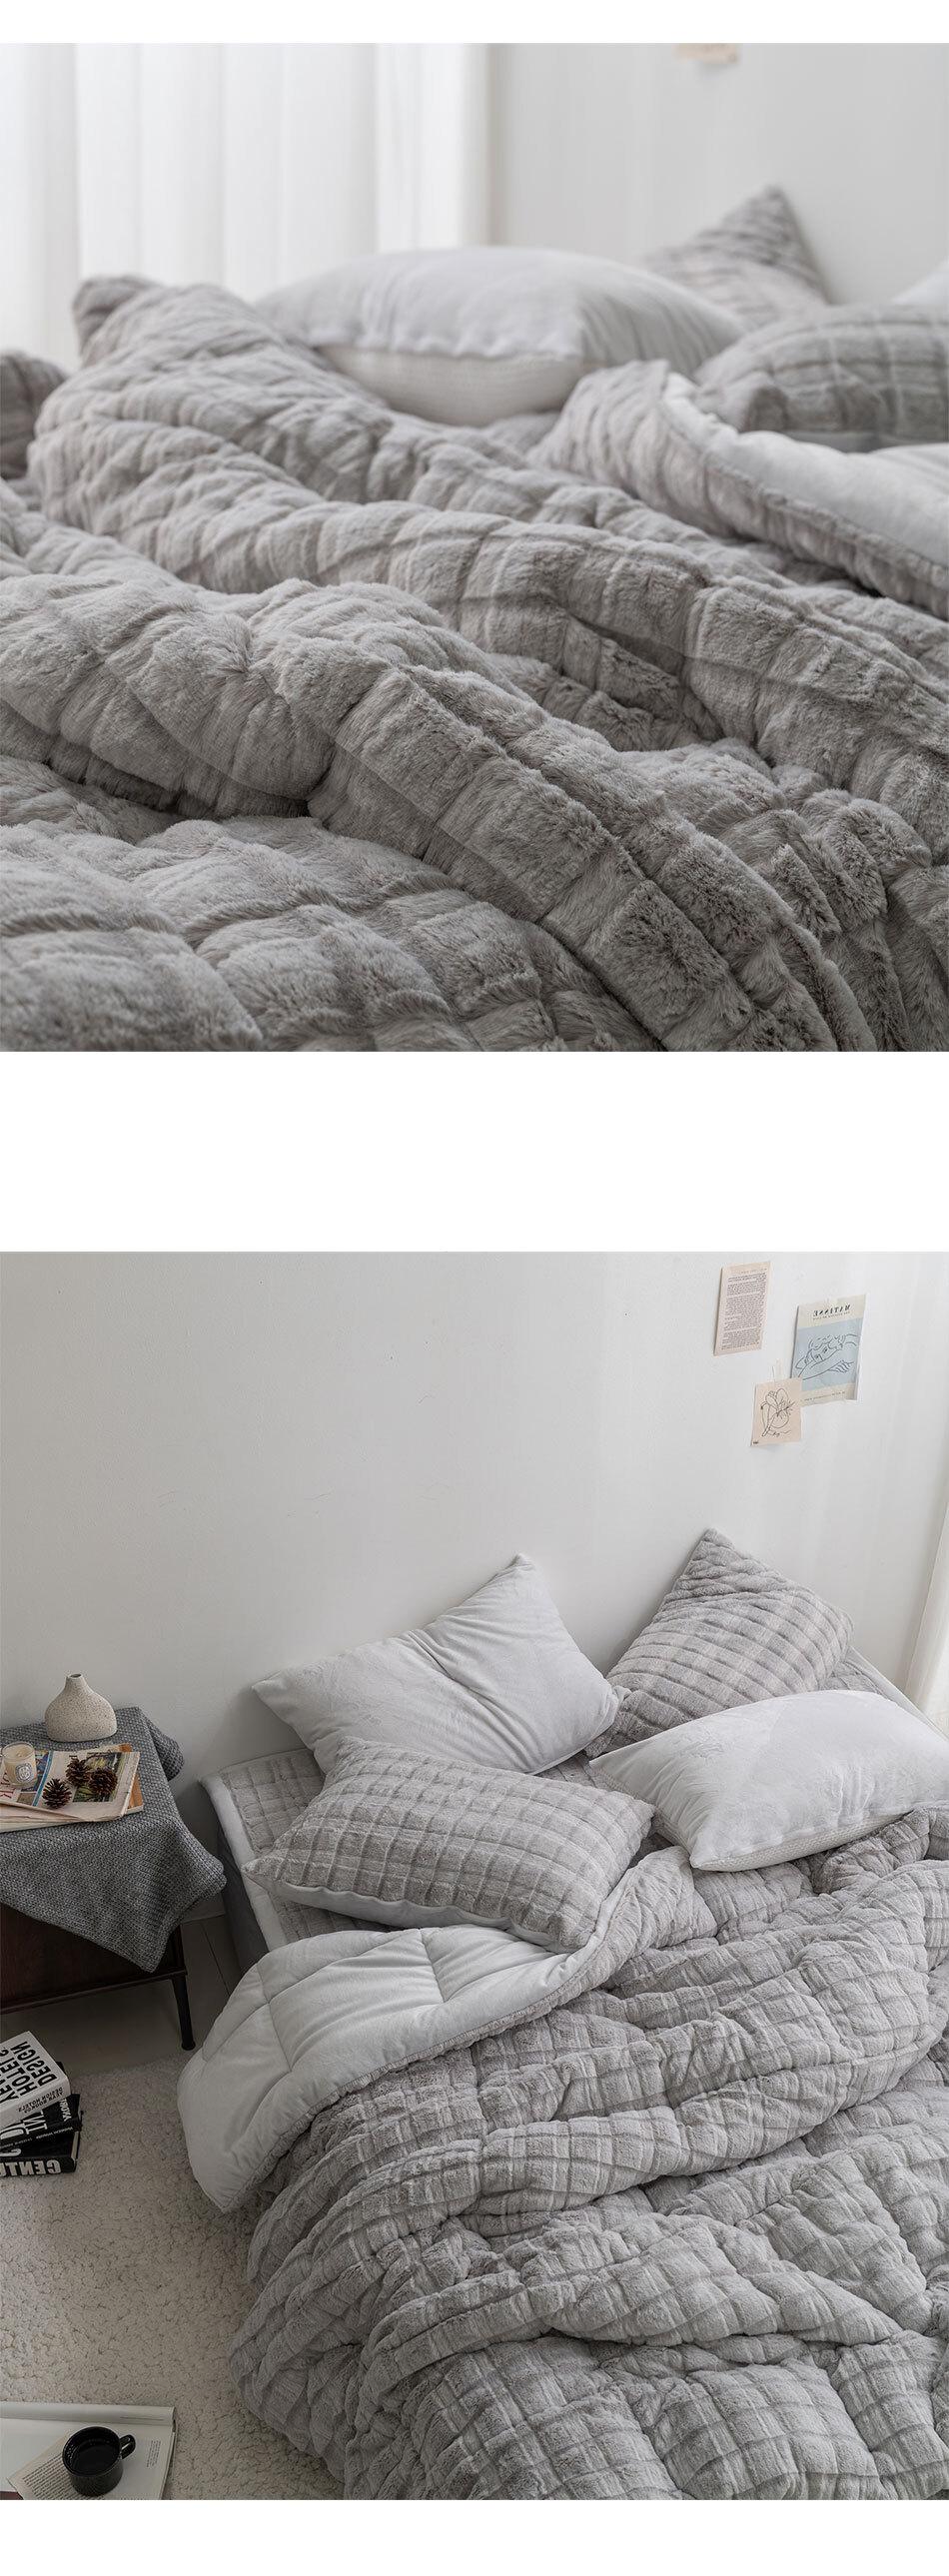 chou_bed_gray_02.jpg